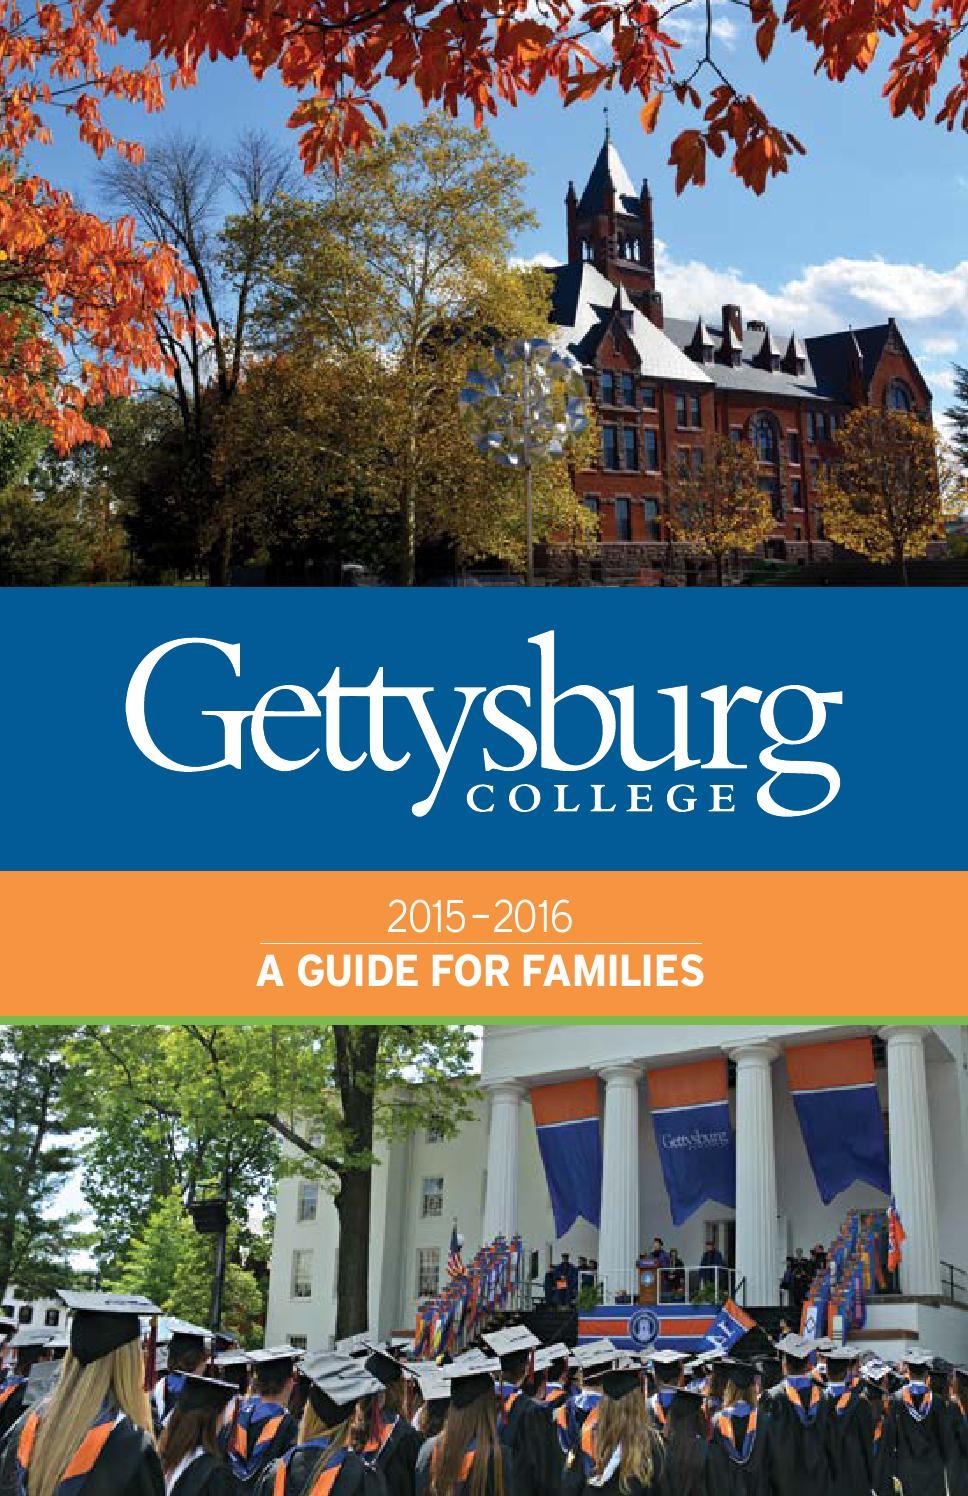 Gettysburg Academic Calendar.Gettysburg College 2015 2016 Guide For Parents By Universityparent